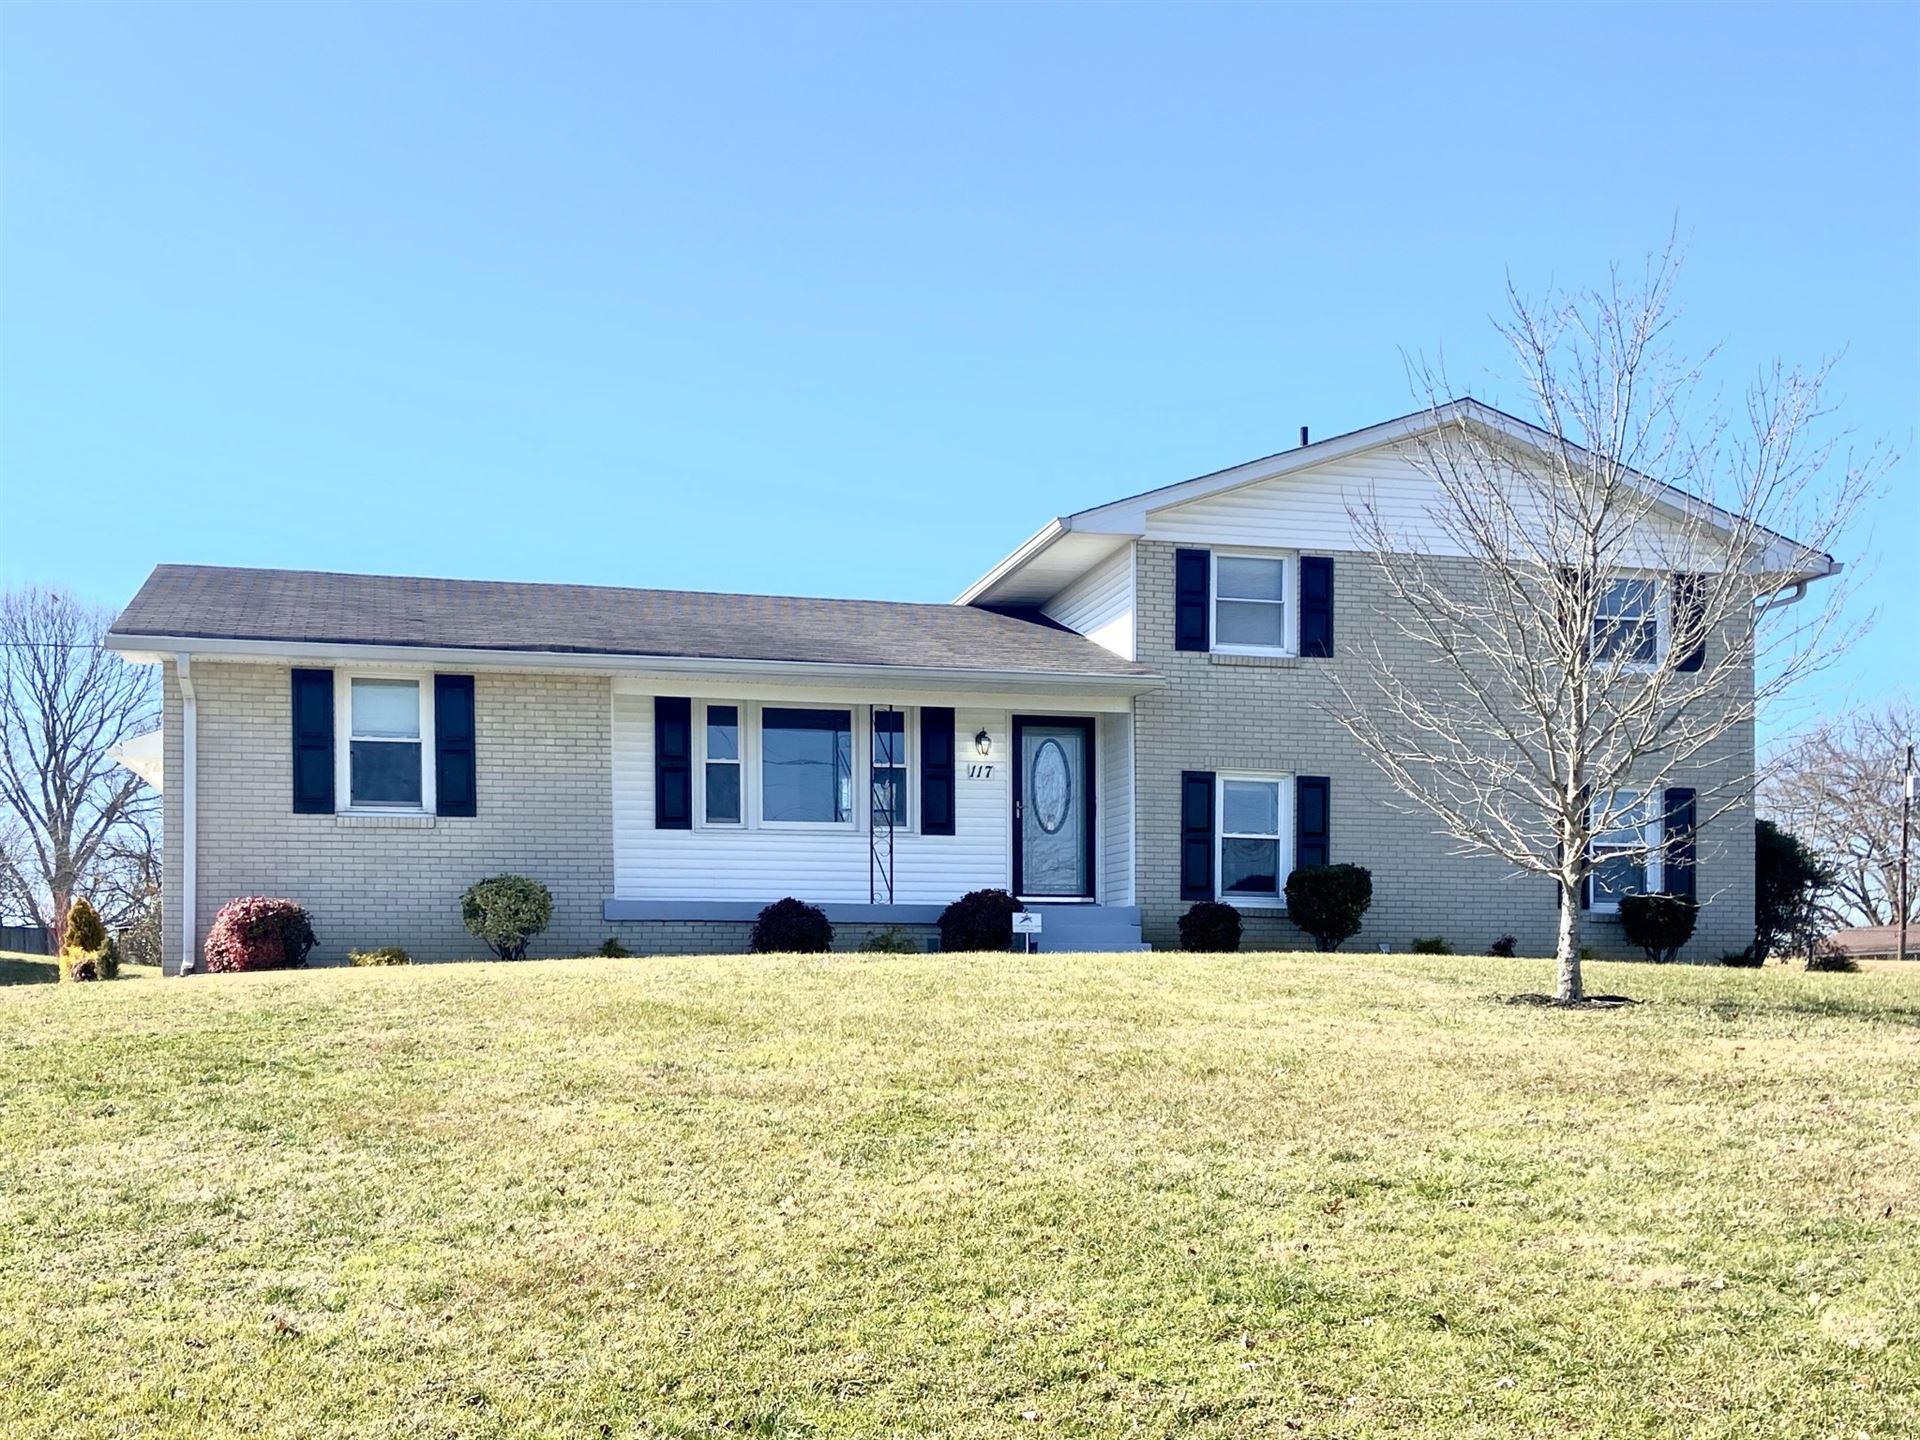 117 Hardaway Dr, Goodlettsville, TN 37072 - MLS#: 2201336